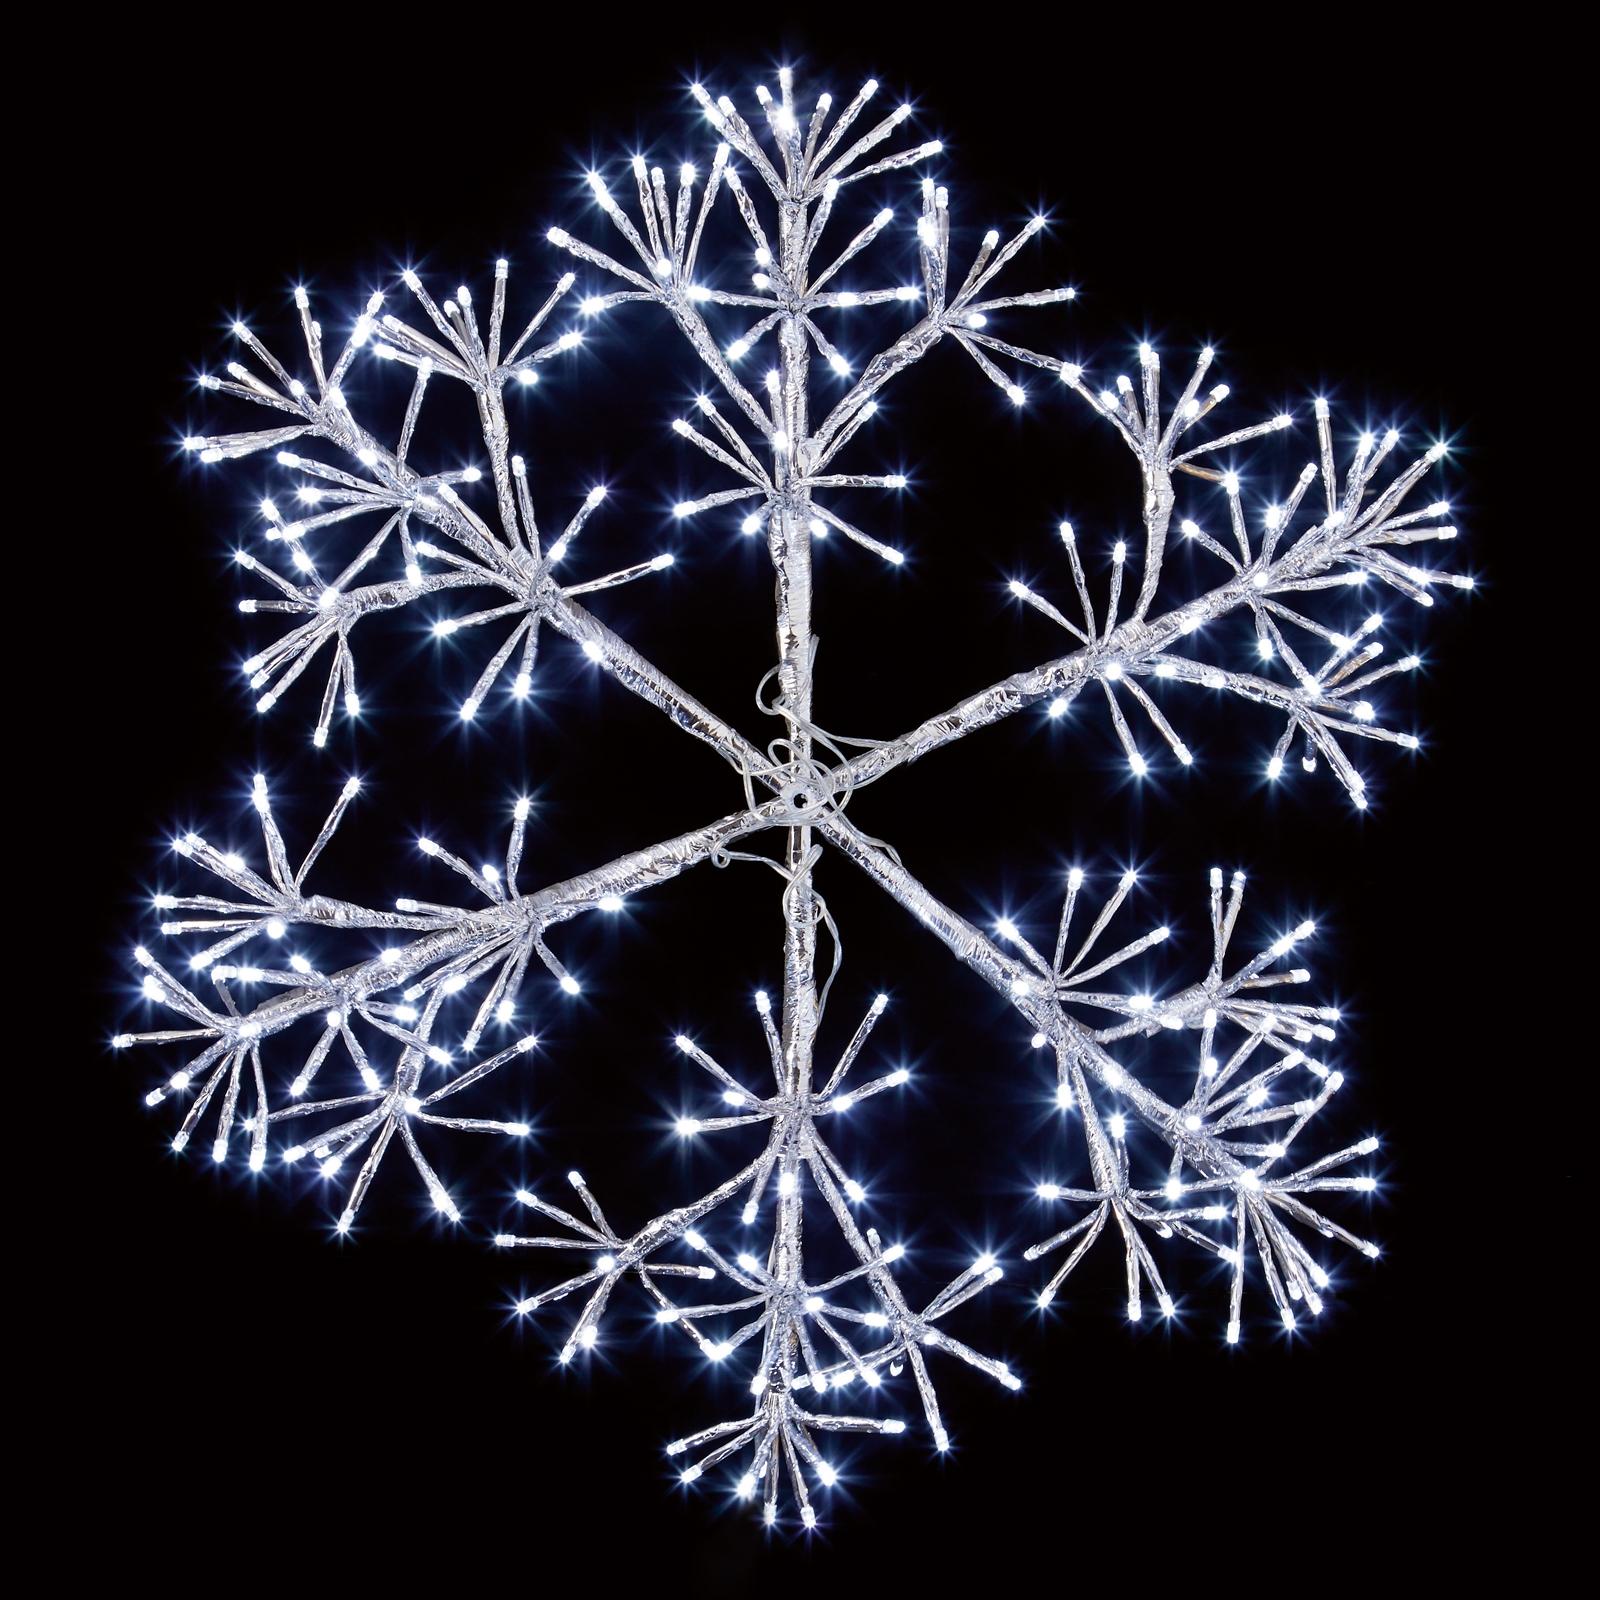 60cm Silver Starburst Snowflake Decoration